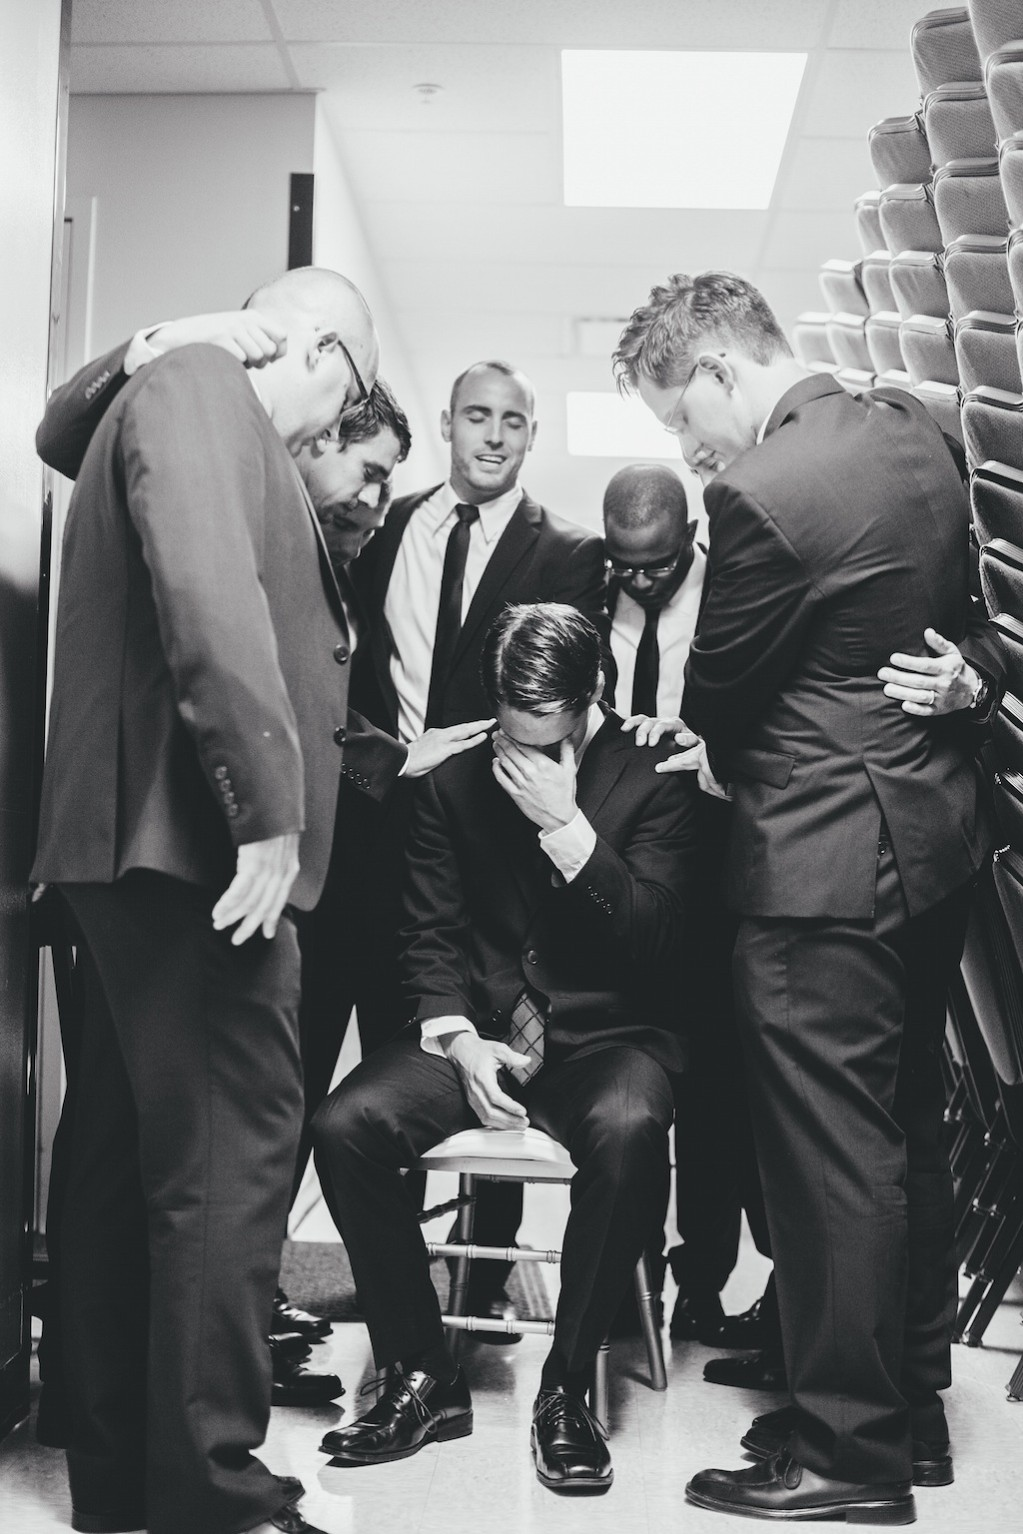 Groom Prayer on Wedding Day